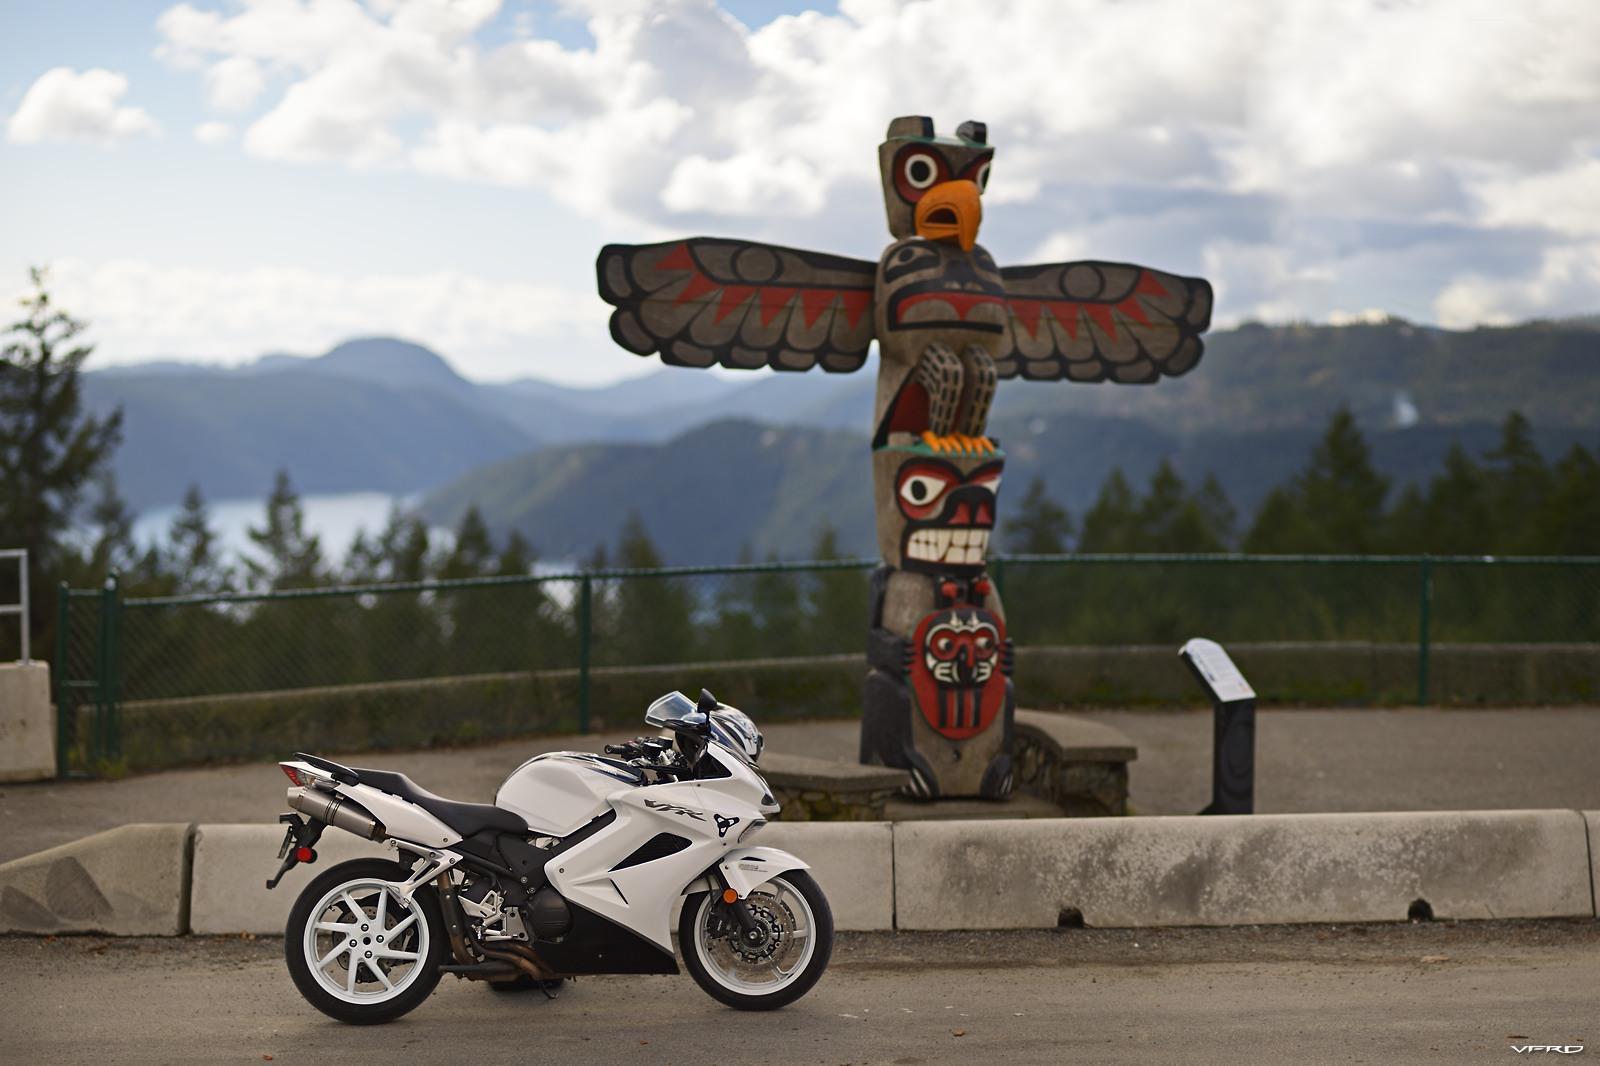 Salish Bear Totem pole at Malahat Summit